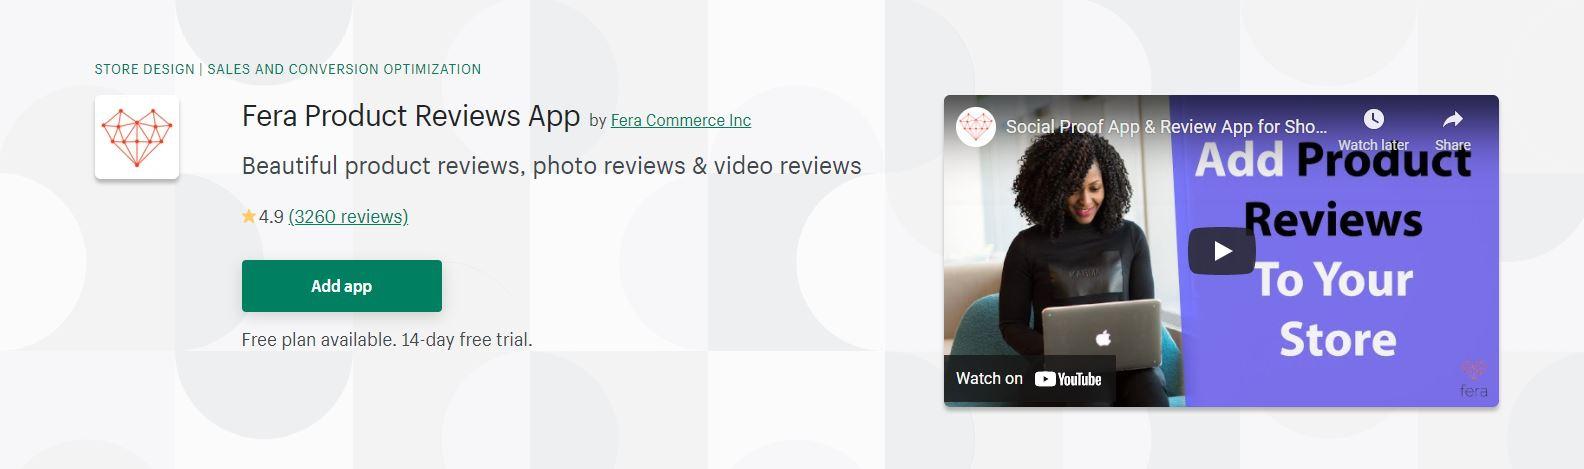 Fera Product Reviews App